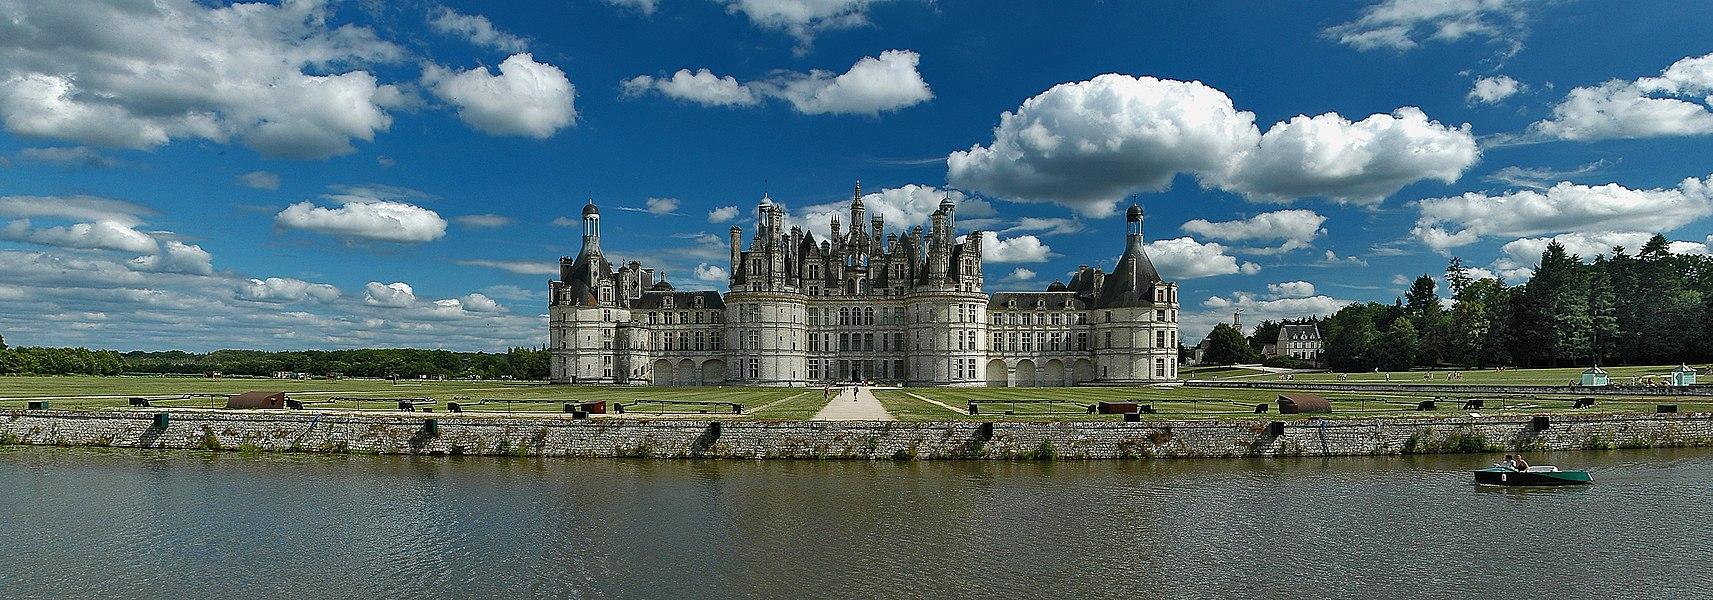 North façade of Château de Chambord